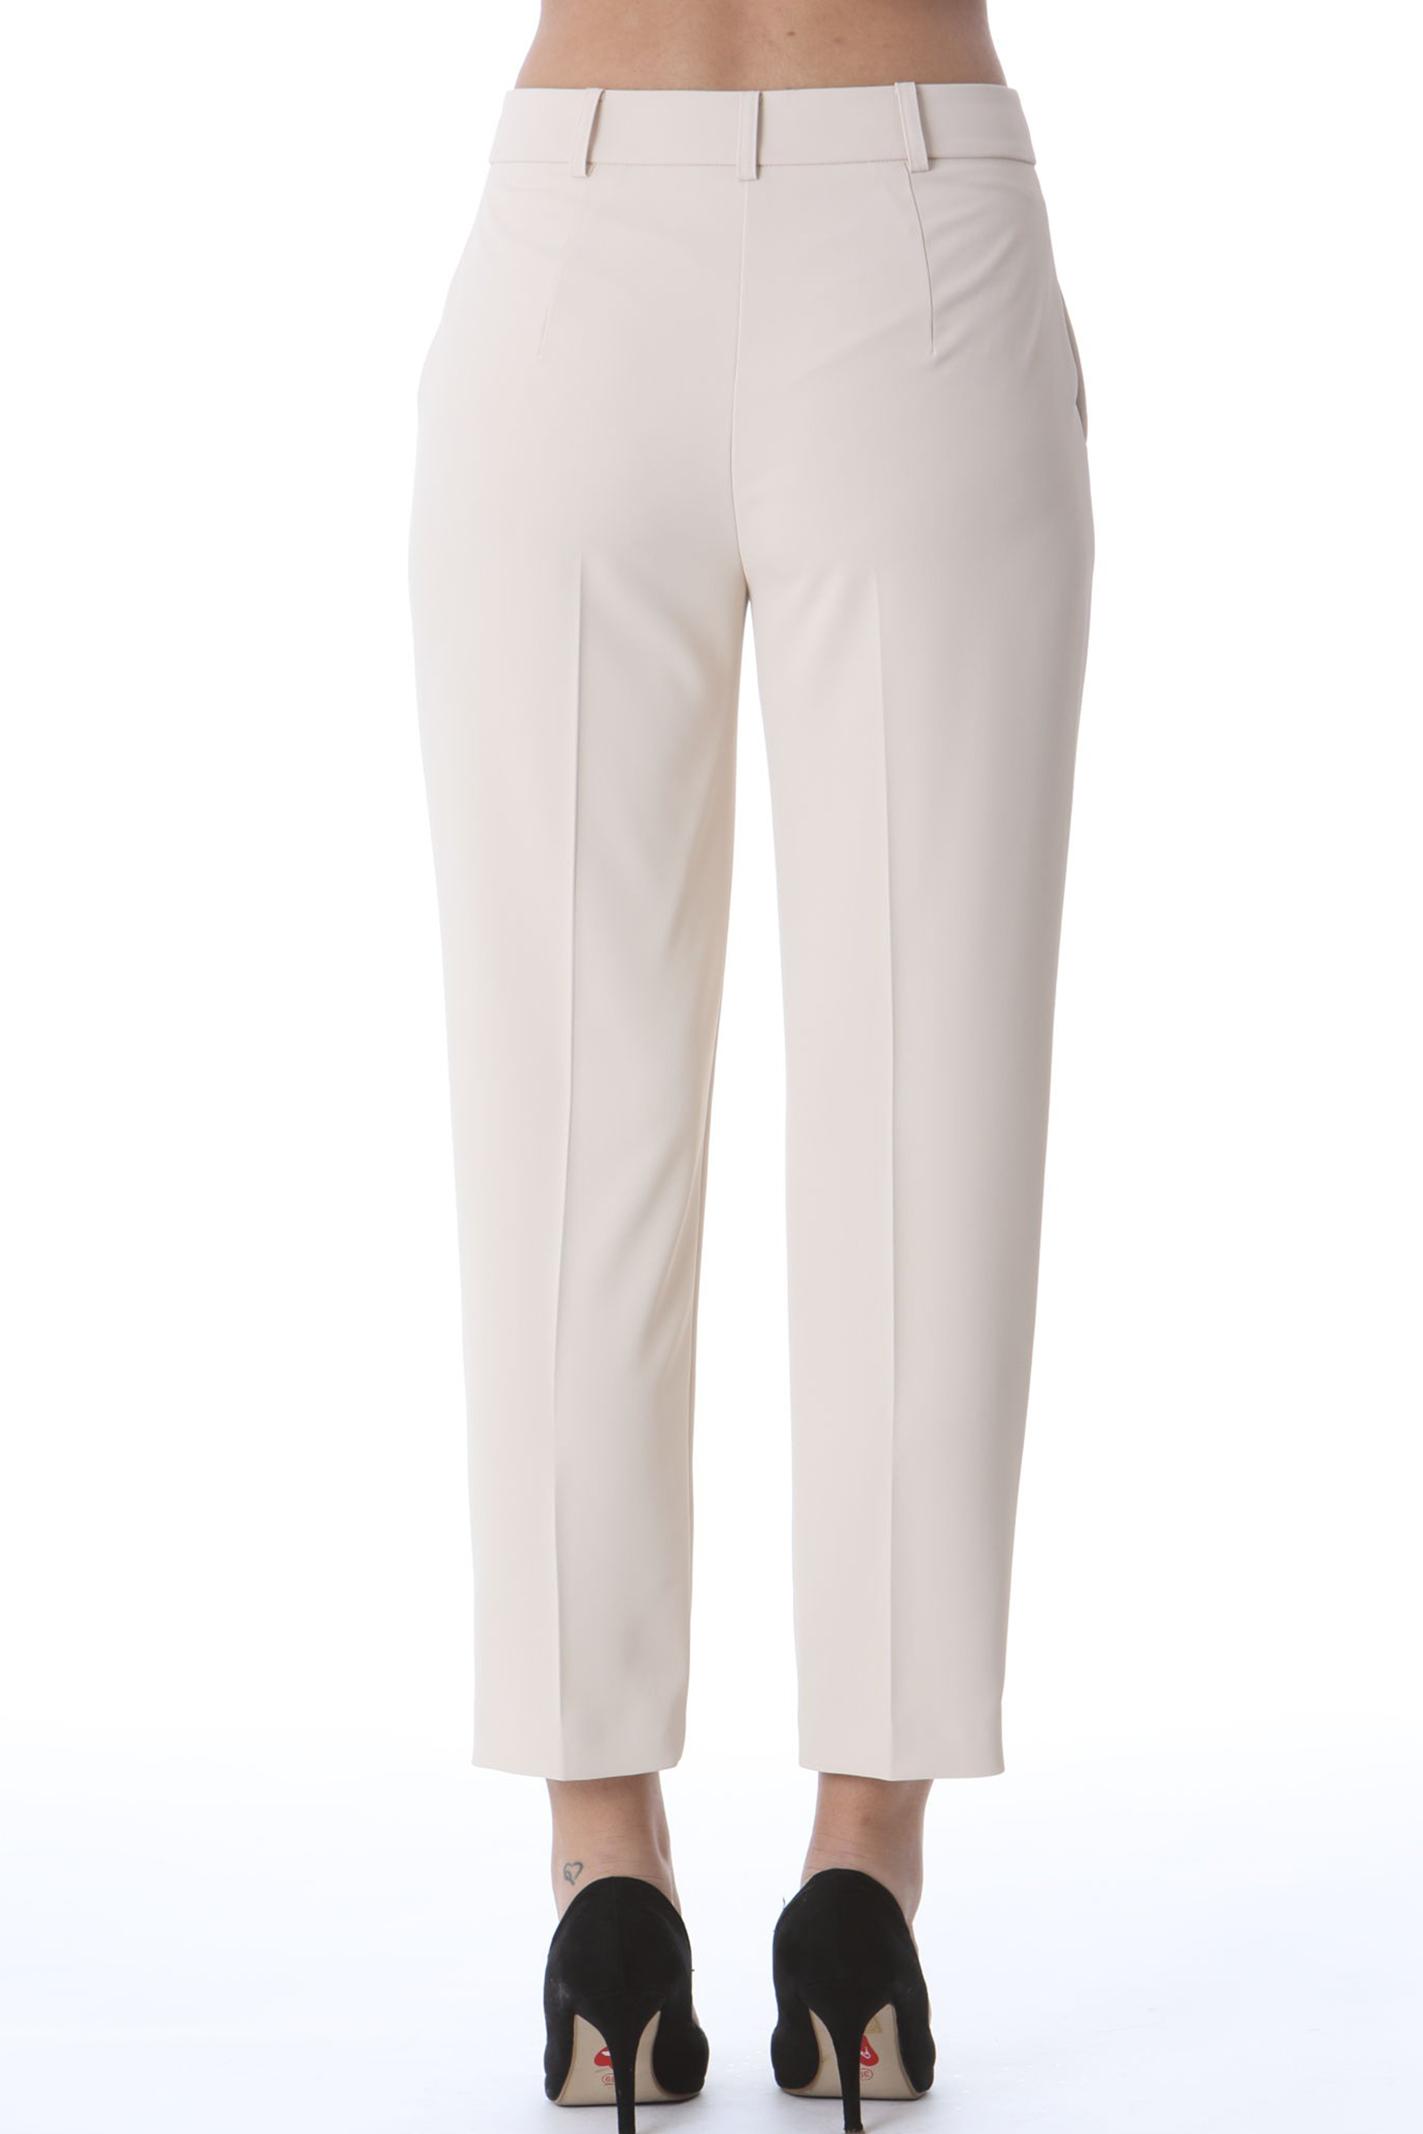 Pantalone donna a sigaretta PATRIZIA PEPE | Pantaloni | 2P1300/A9A2B718